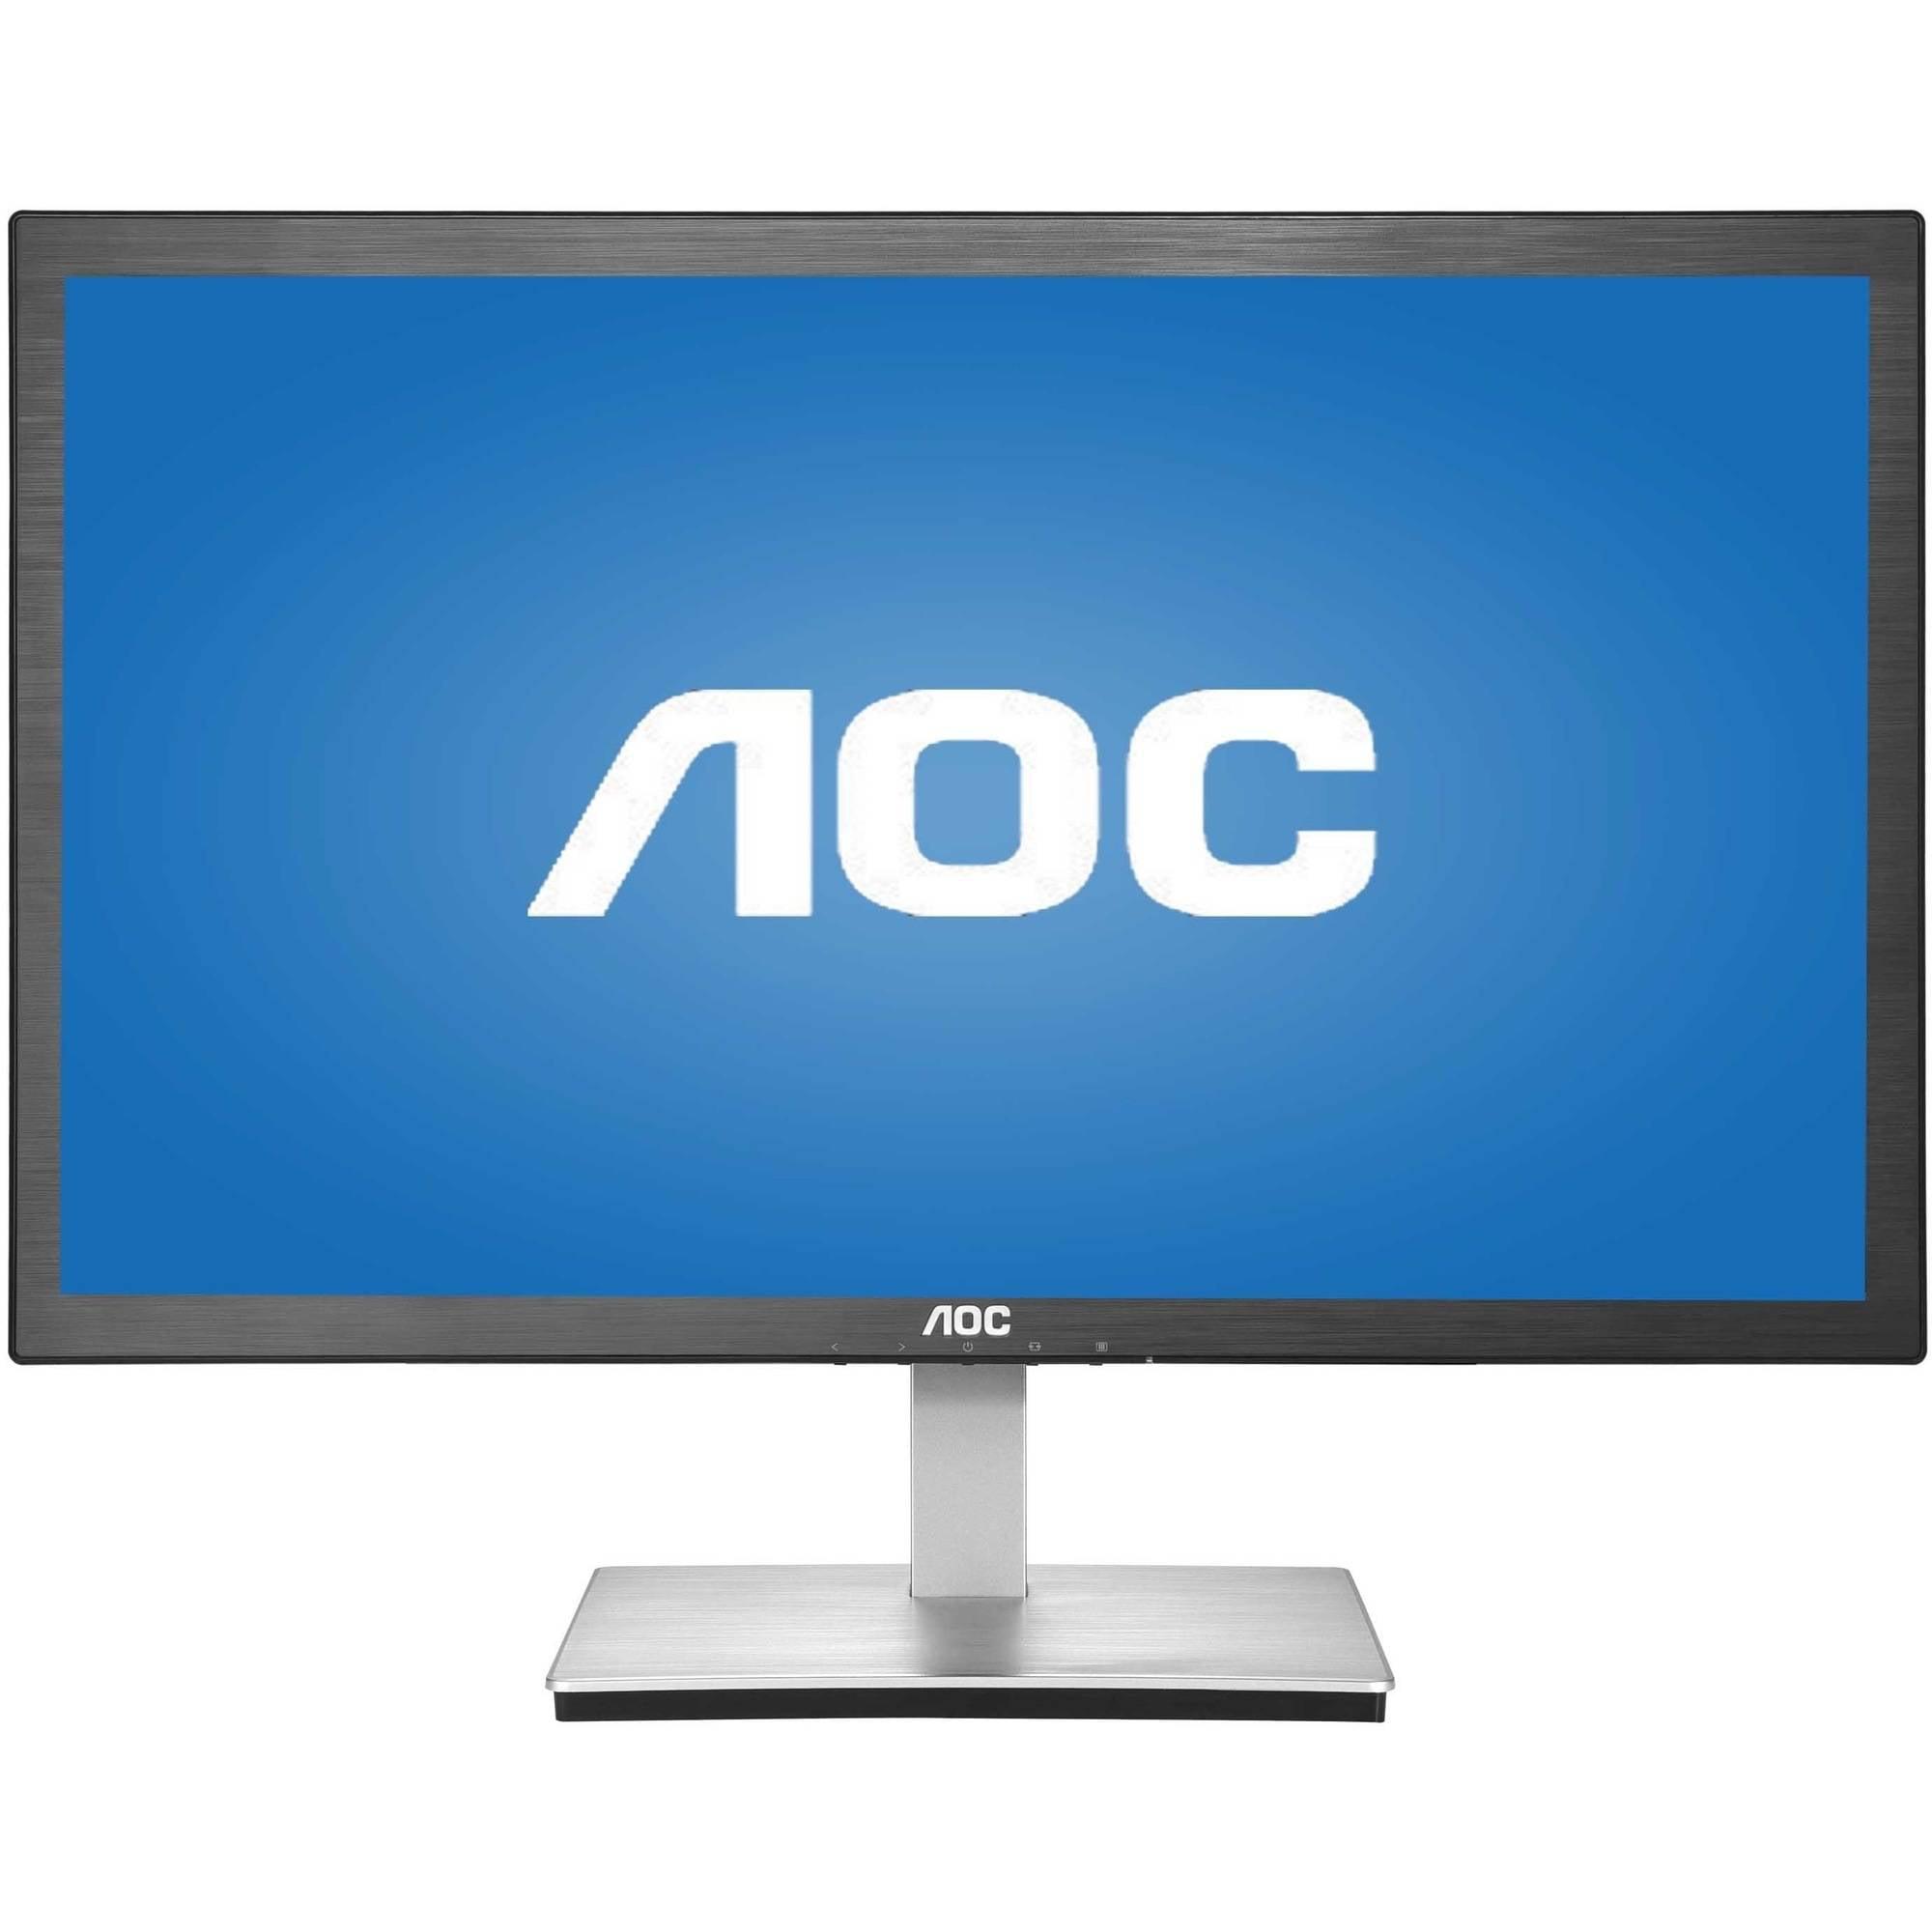 "AOC Monitor 24"" IPS Panel Full HD 1920x1080 5ms VGA HDMI (MHL) I2476VWM"